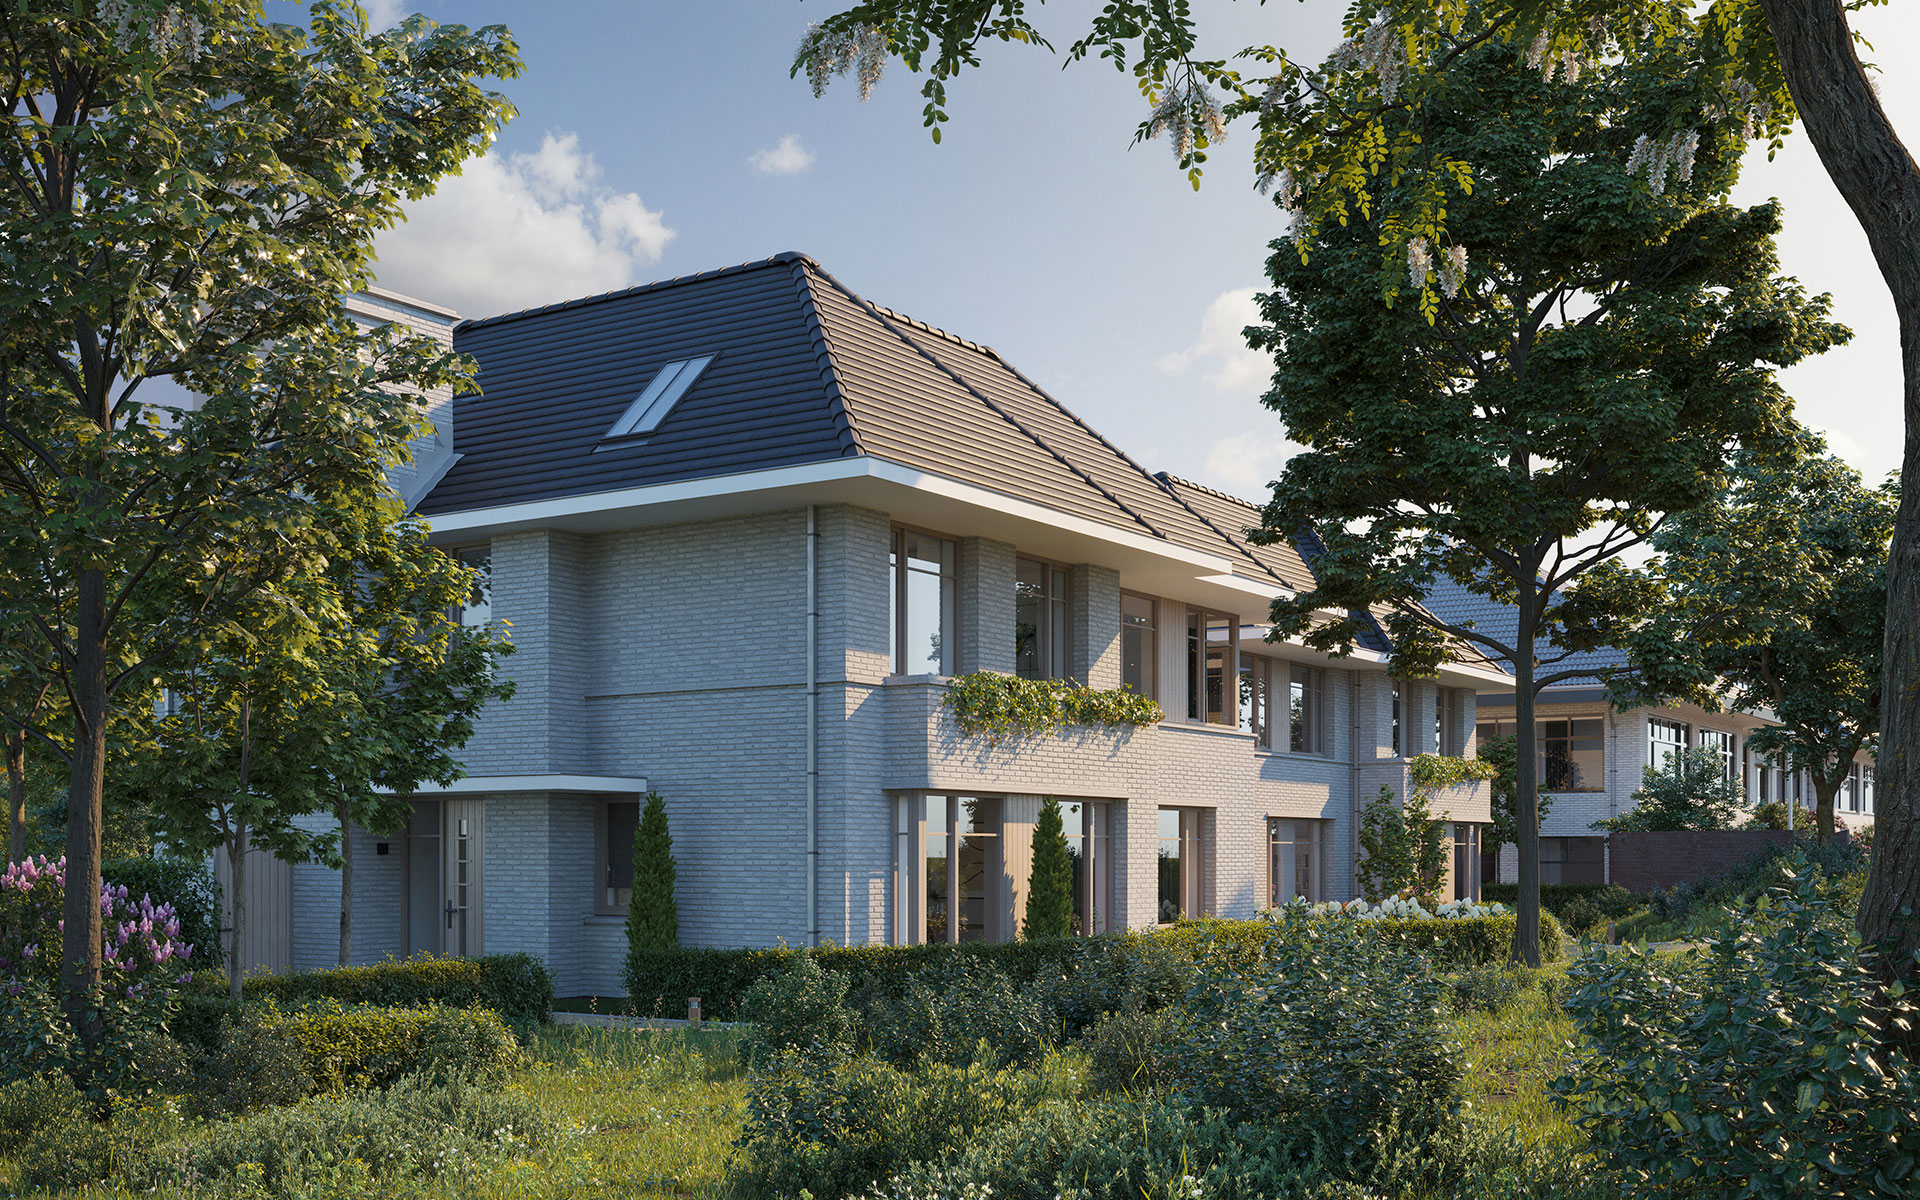 Nieuwbouwwoningen-Brouwerskolk-Overveen-Foto